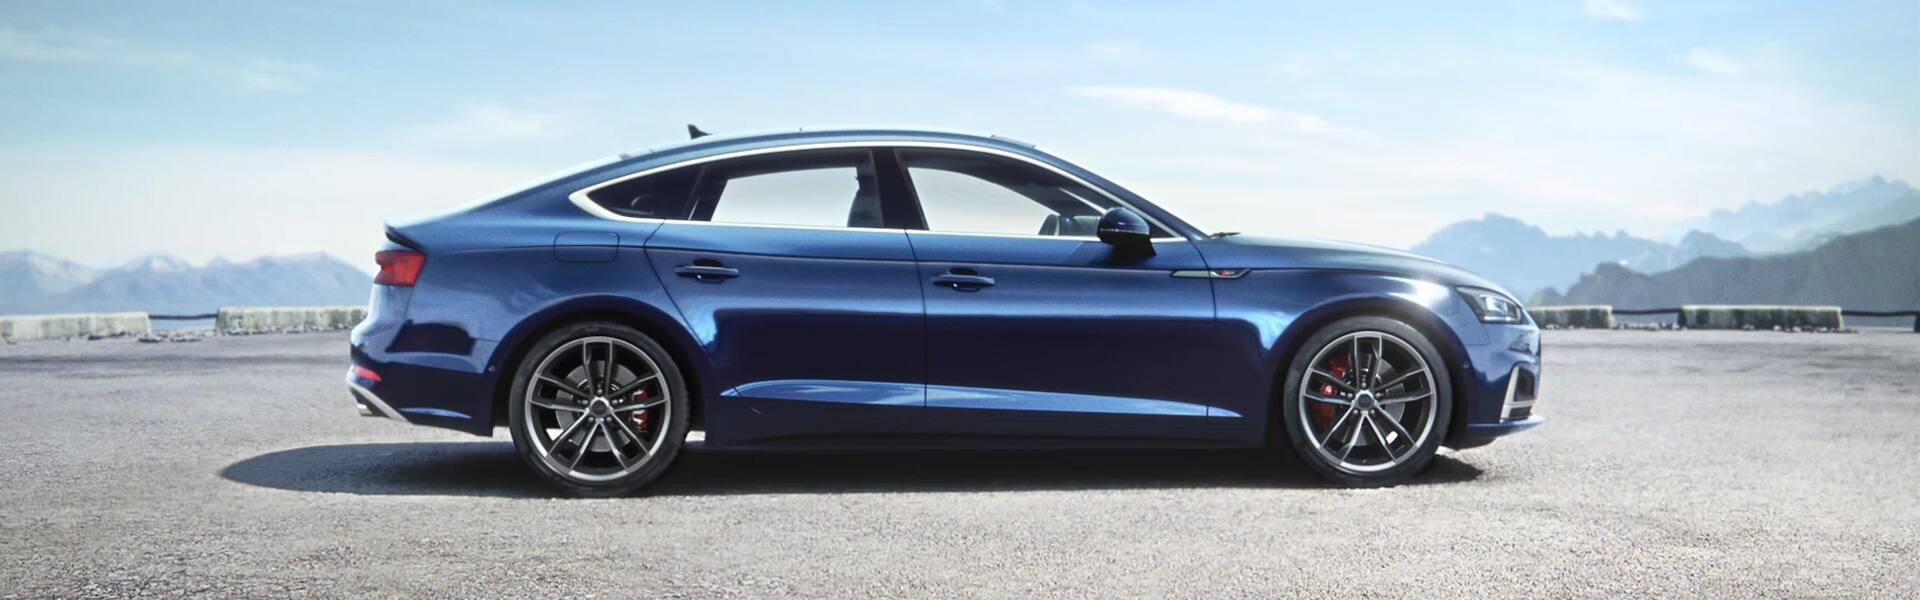 Audi S5 Sportback > Audi A5 > Audi Bahrain